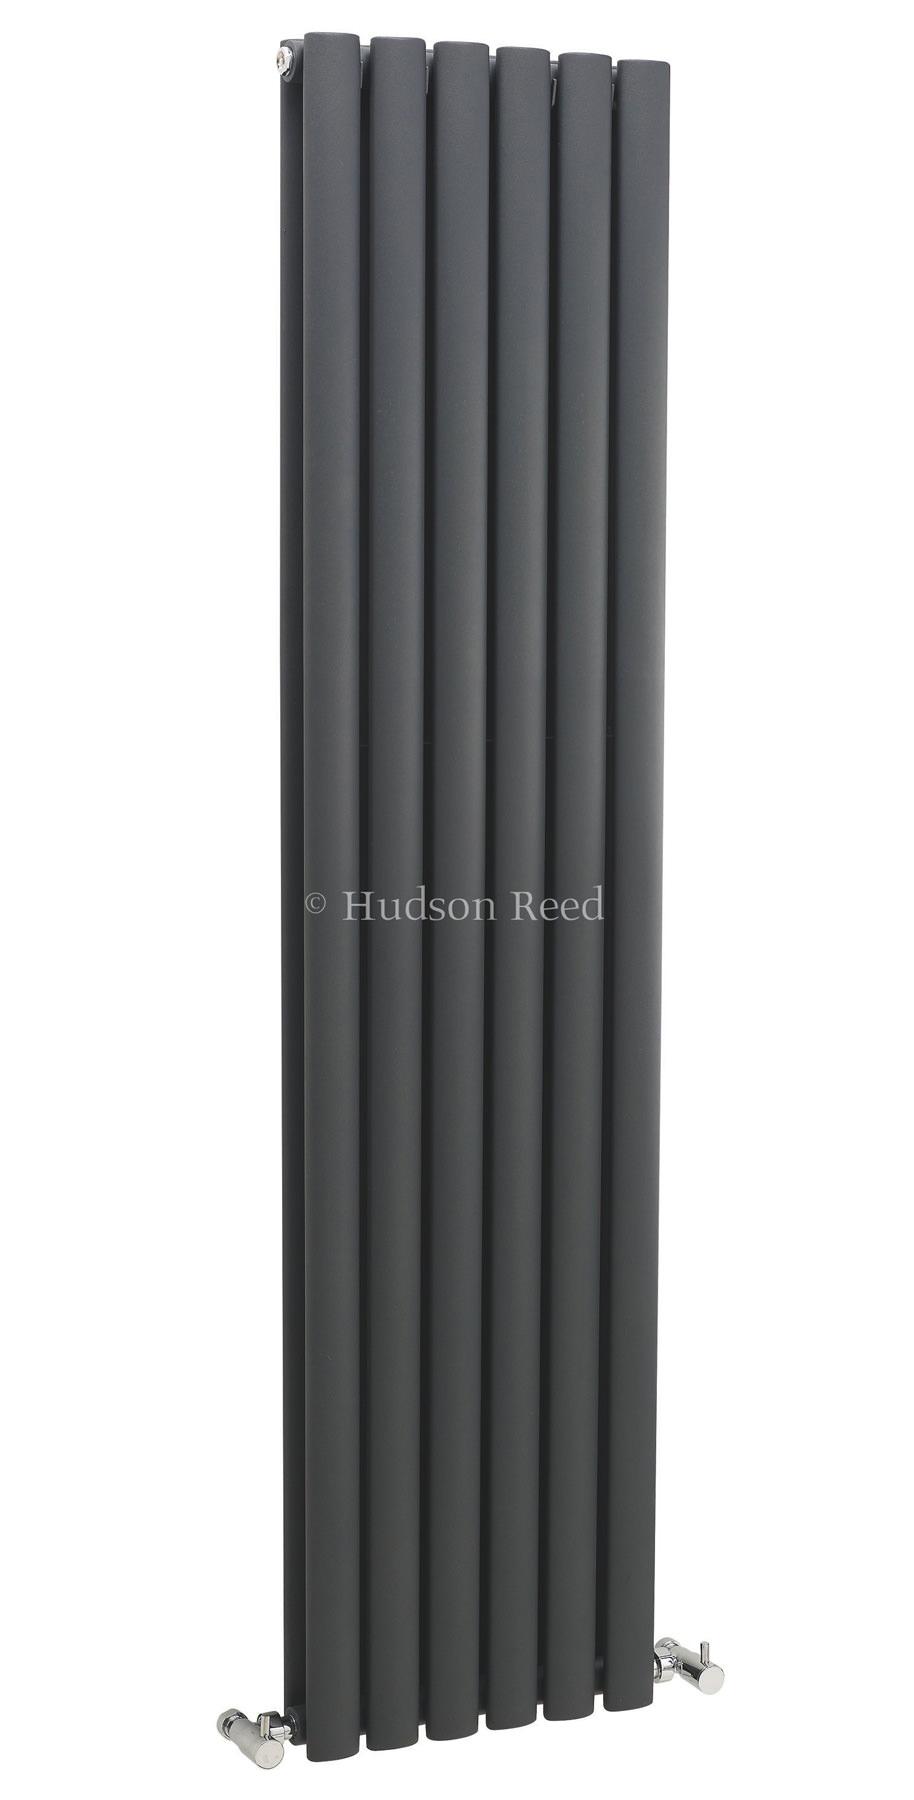 hudson reed revive 354 x 1500mm anthracite double panel. Black Bedroom Furniture Sets. Home Design Ideas